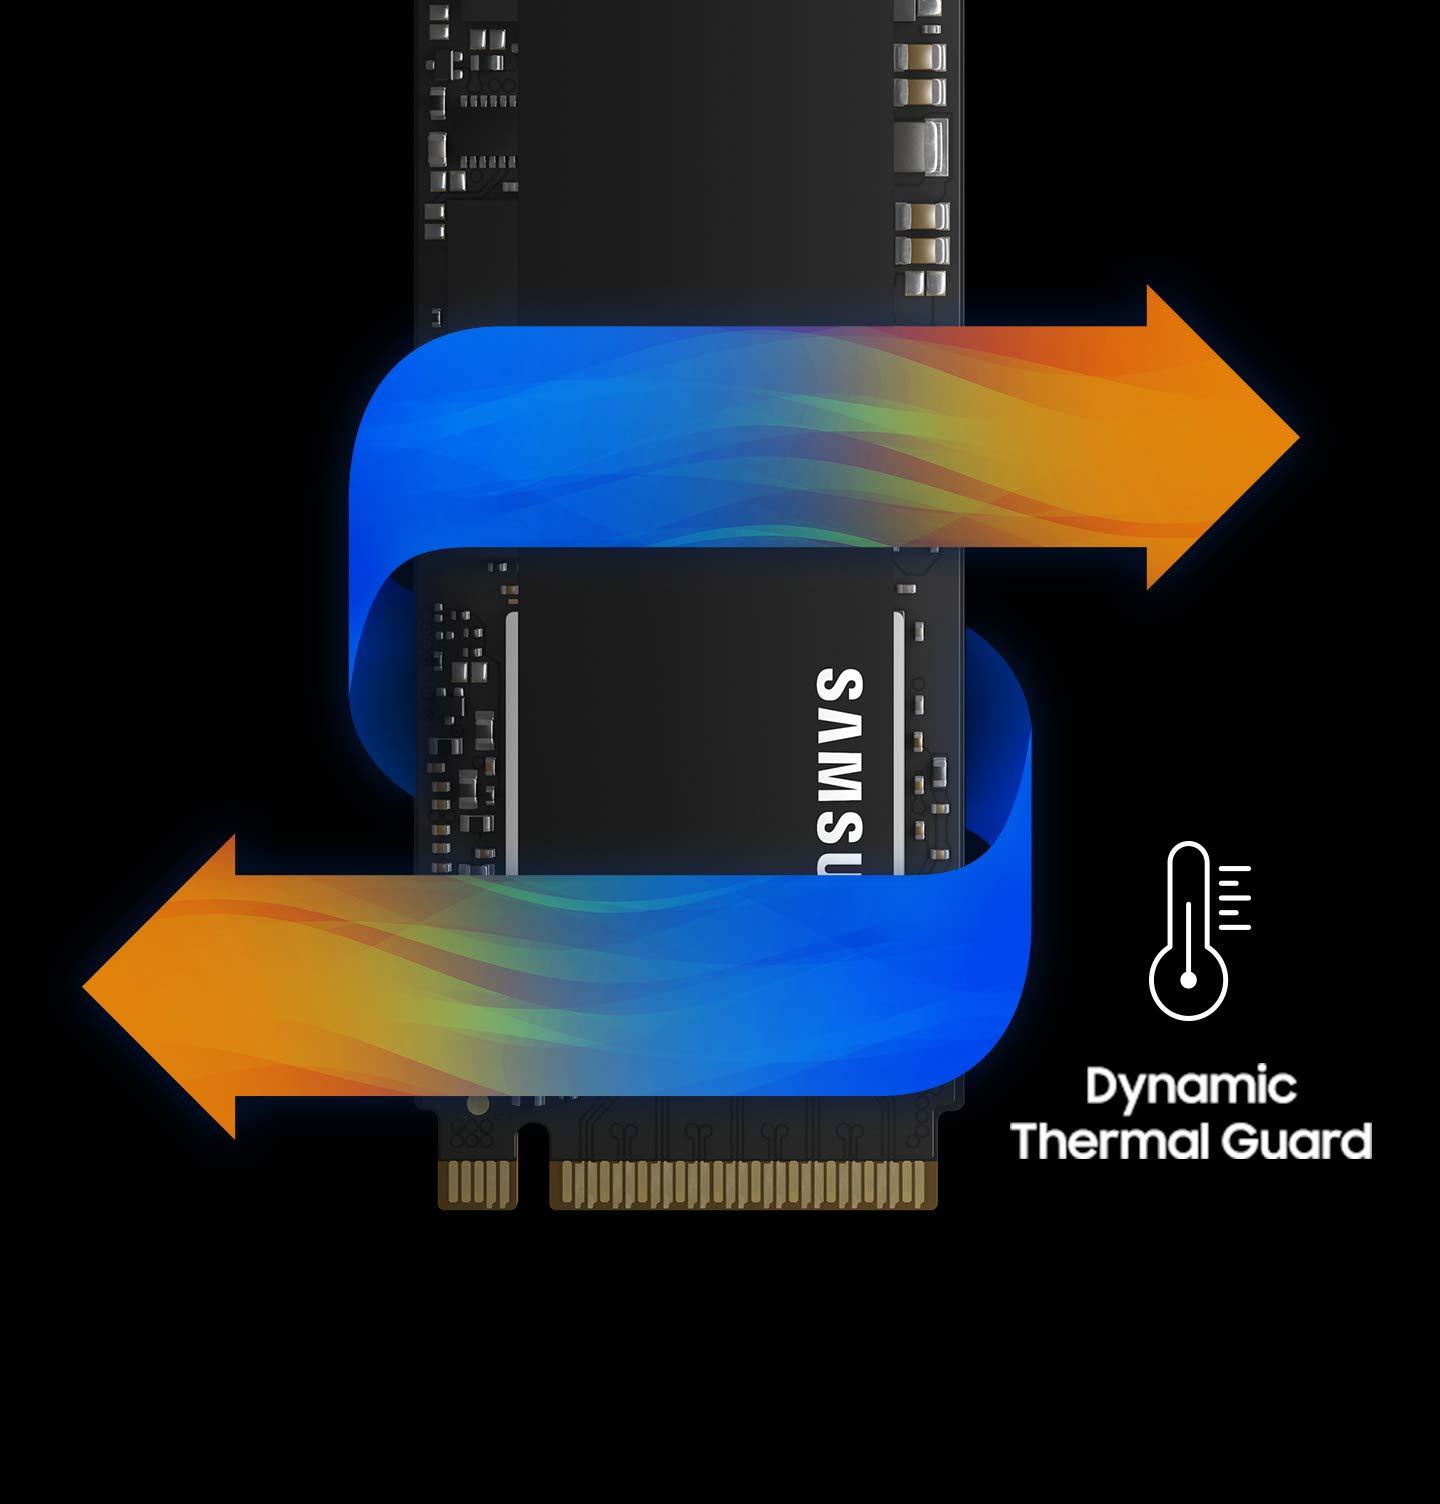 Samsung 970 EVO Plus Series - 500GB PCIe NVMe - M.2 Internal SSD (MZ-V7S500B/AM) by Samsung (Image #6)